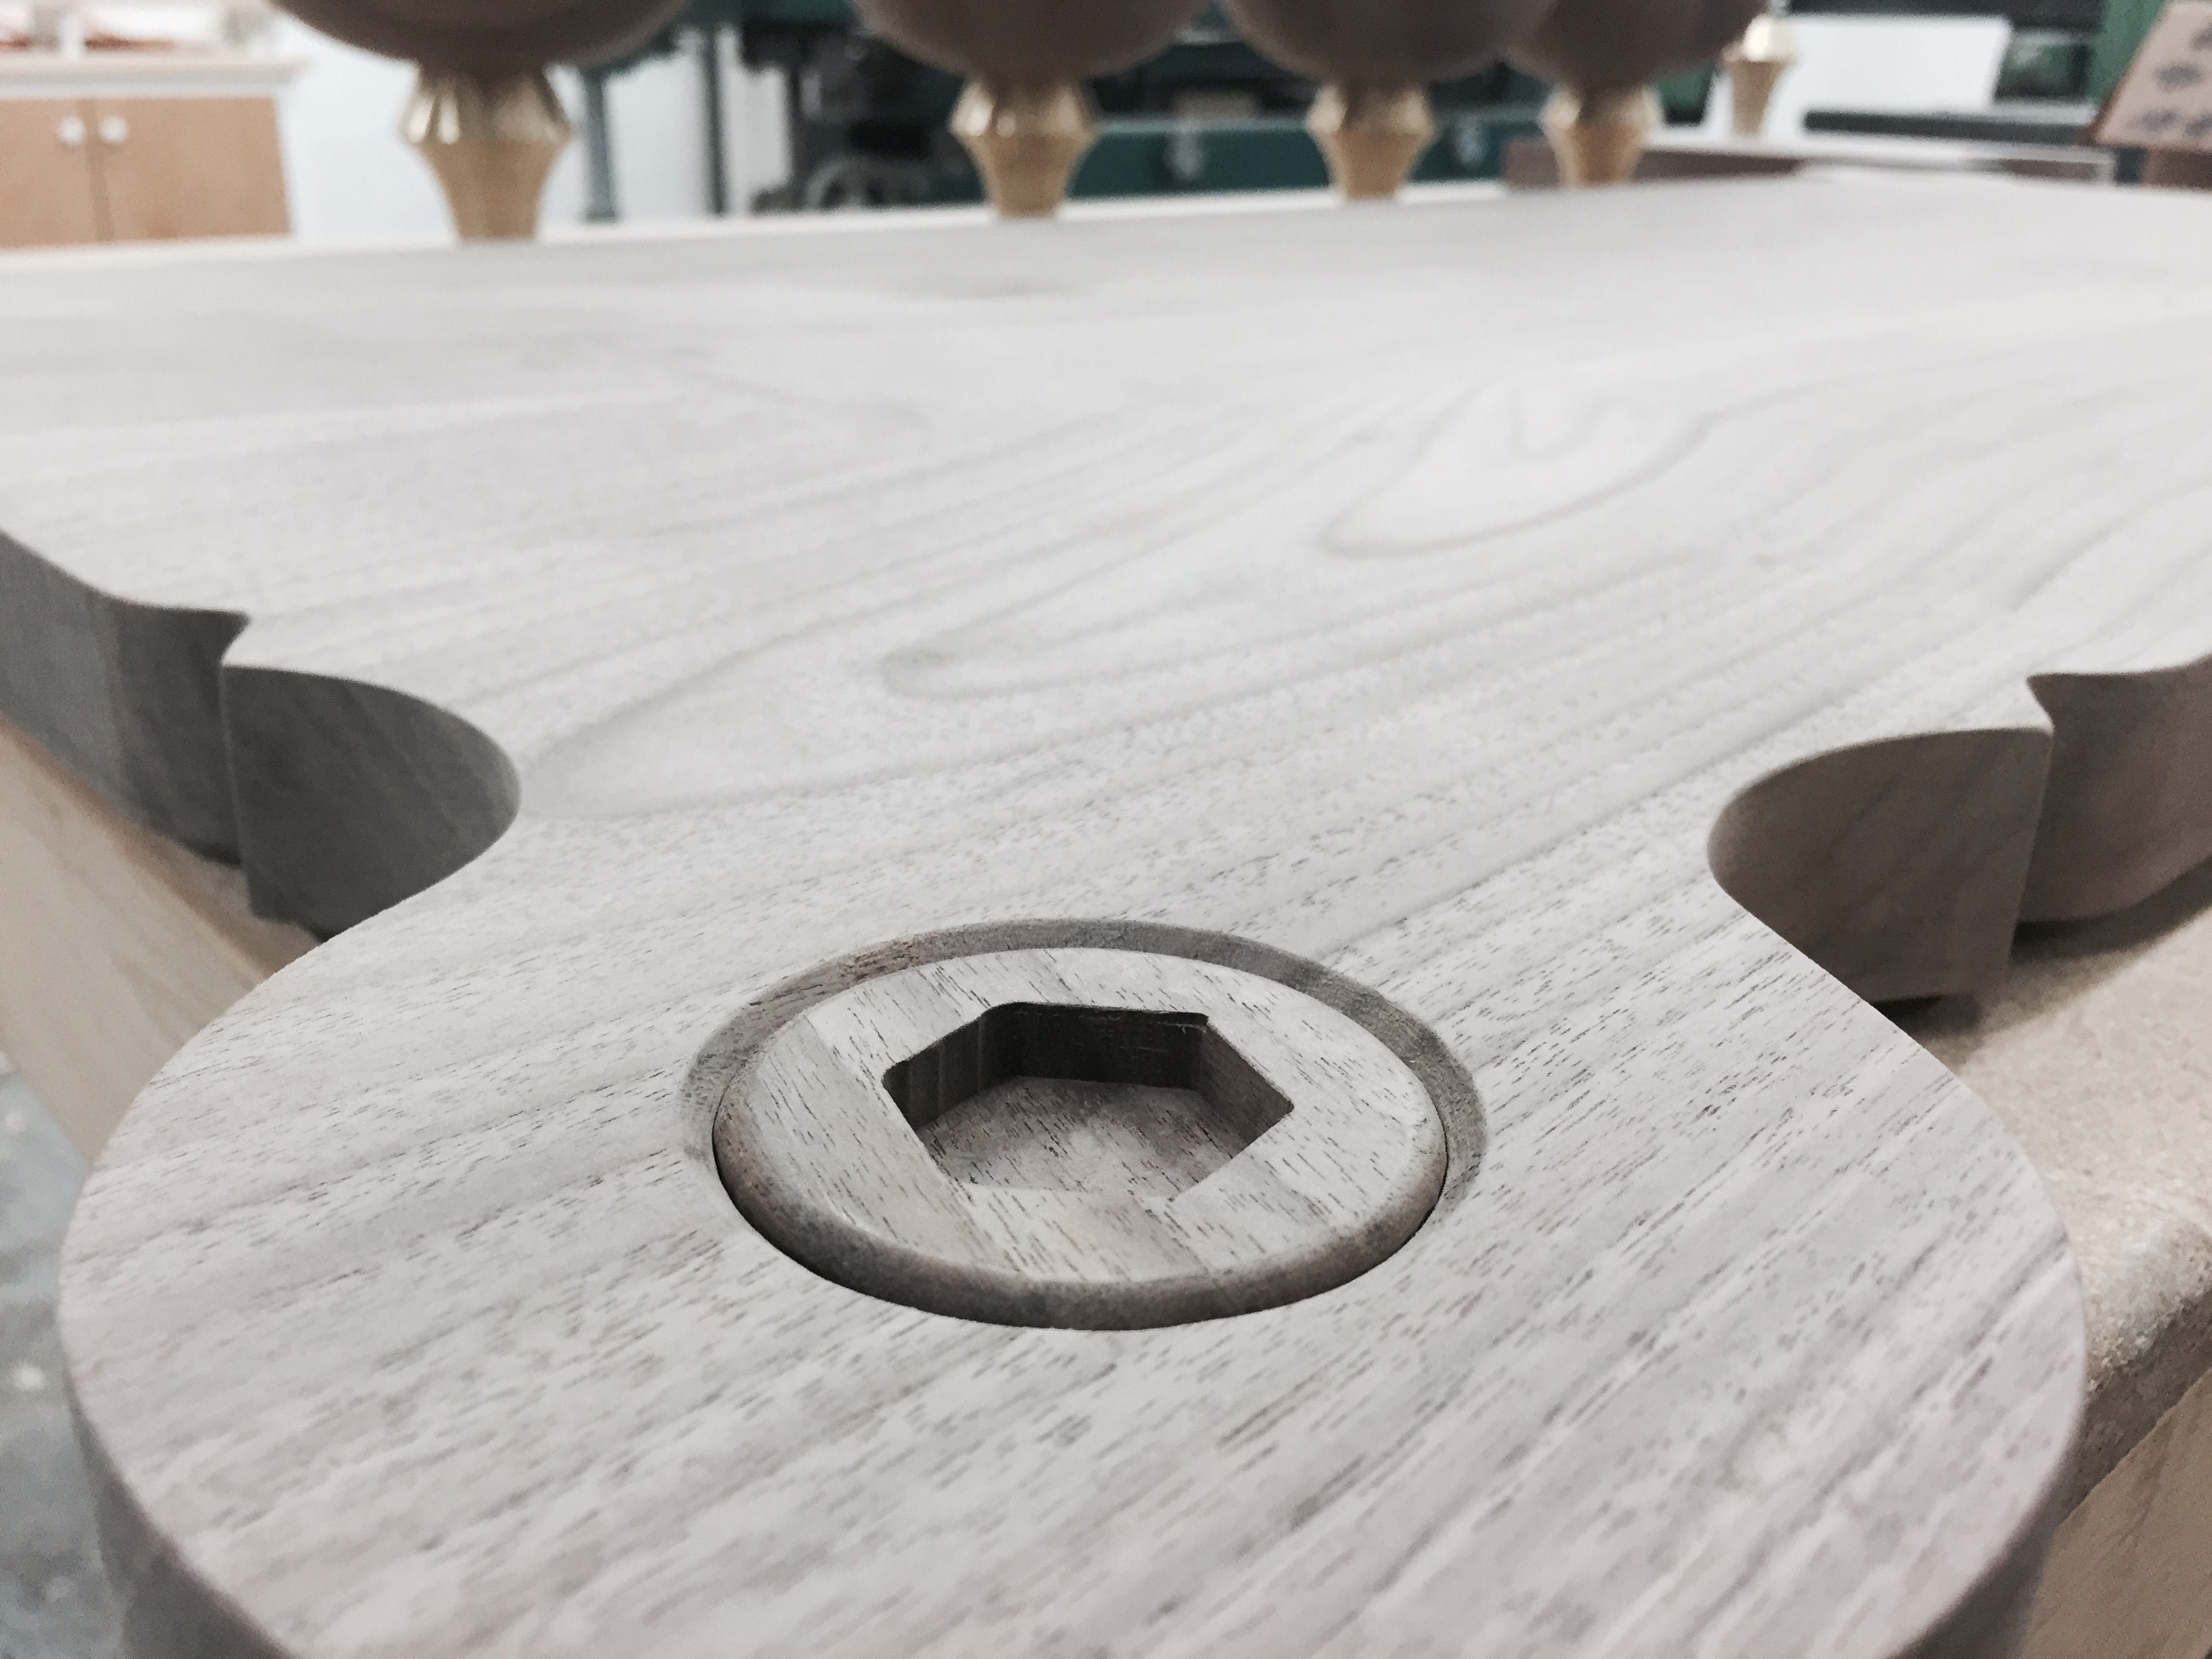 Coffee-table-corner-close-up-3500-3500